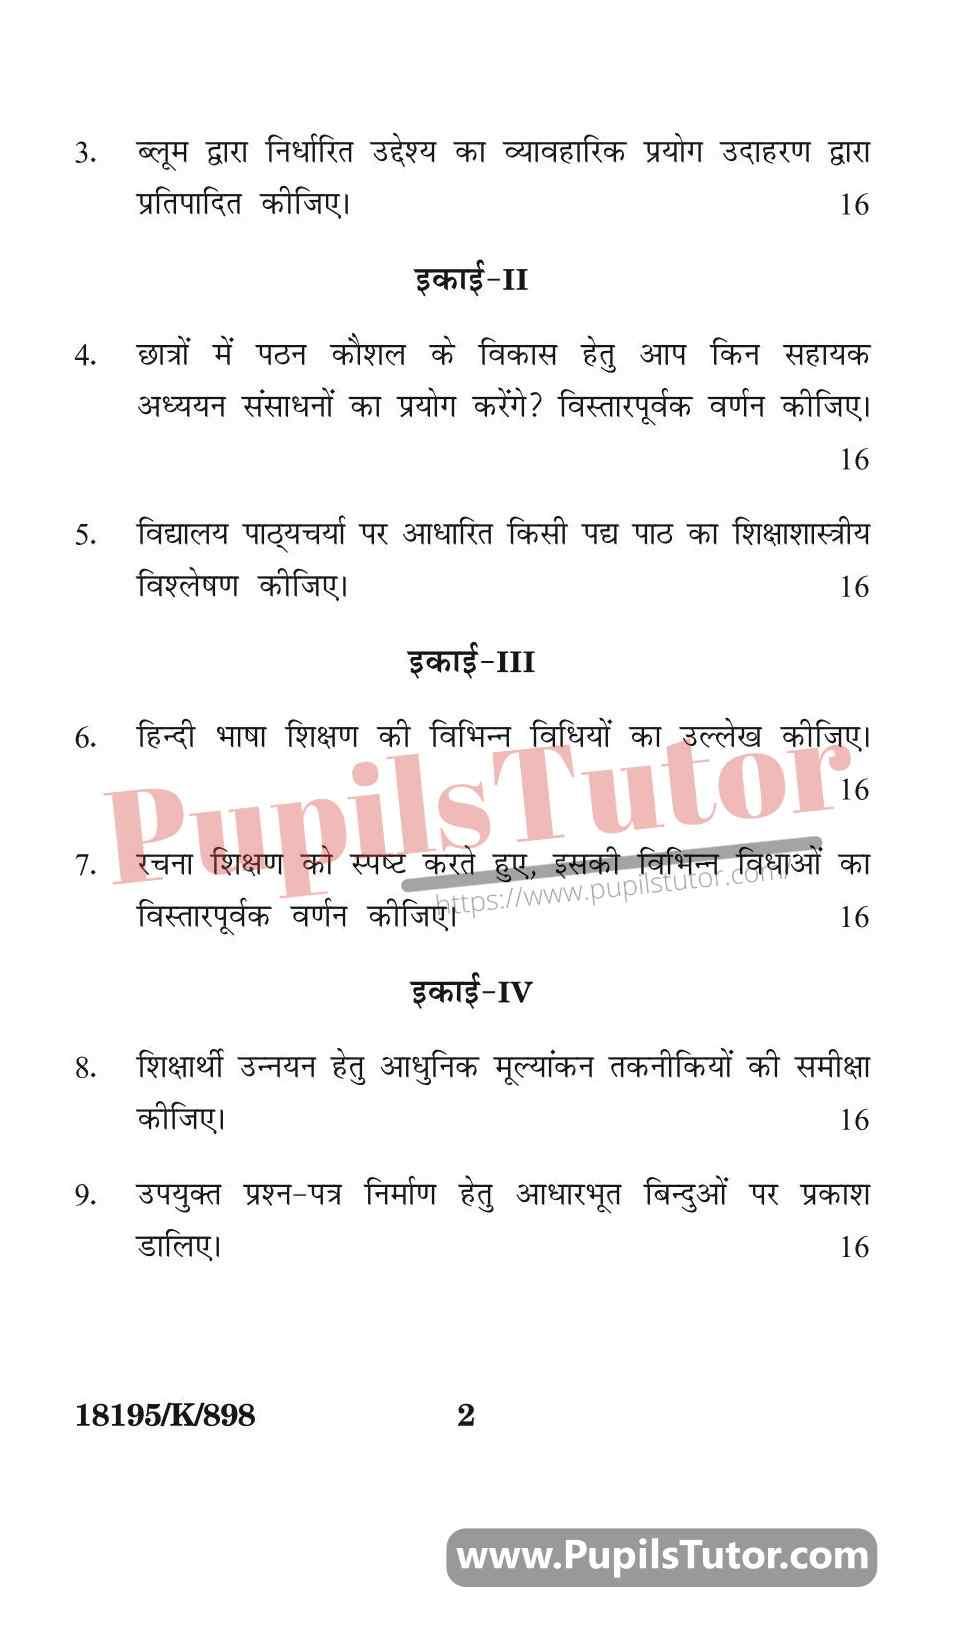 KUK (Kurukshetra University, Haryana) Pedagogy Of Hindi Shikshan Question Paper 2020 For B.Ed 1st And 2nd Year And All The 4 Semesters Free Download PDF - Page 2 - www.pupilstutor.com